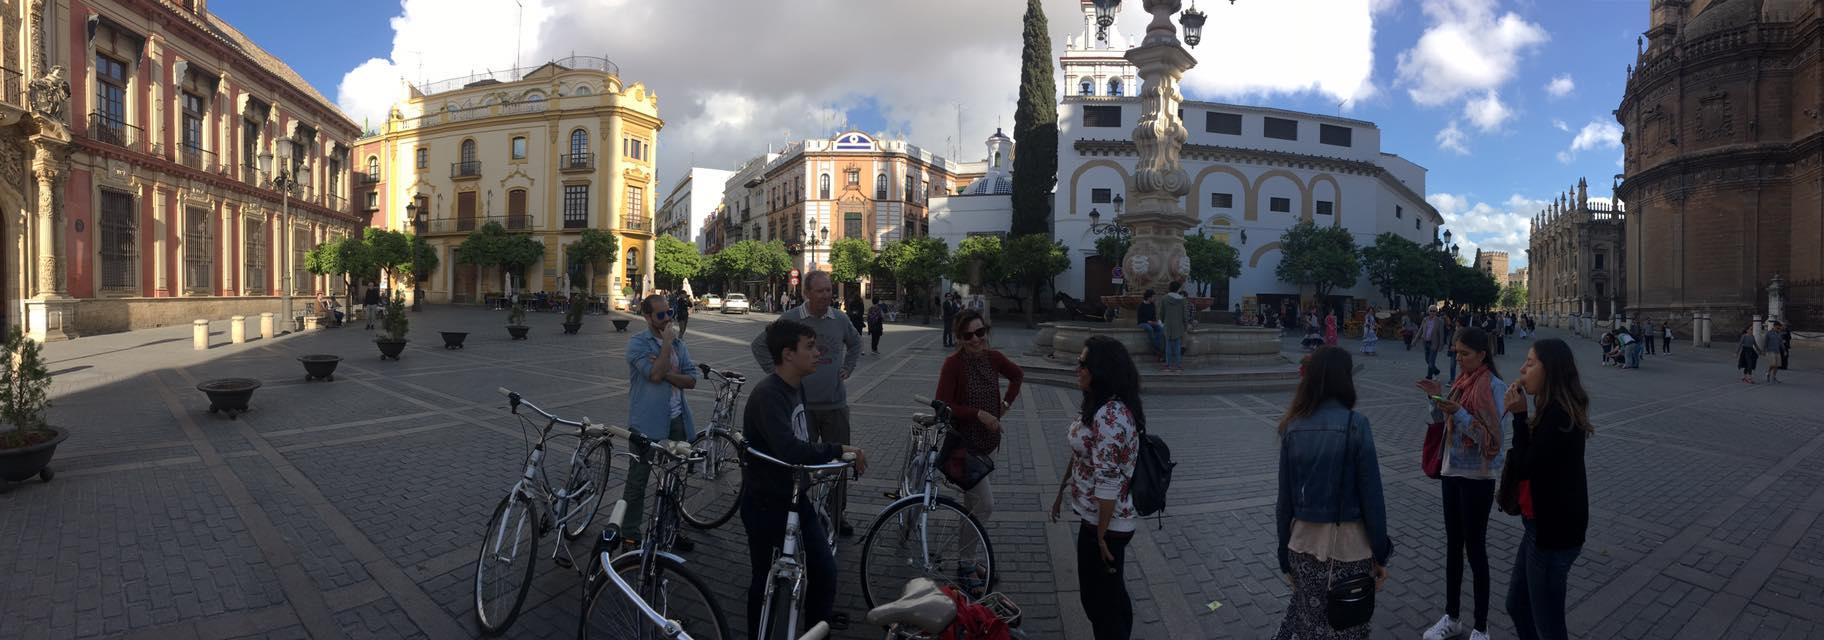 The Most Important Monuments to Visit in Seville Part 3: Plaza de España, Plaza de América & Parque de María Luisa (+ 3 Museums)